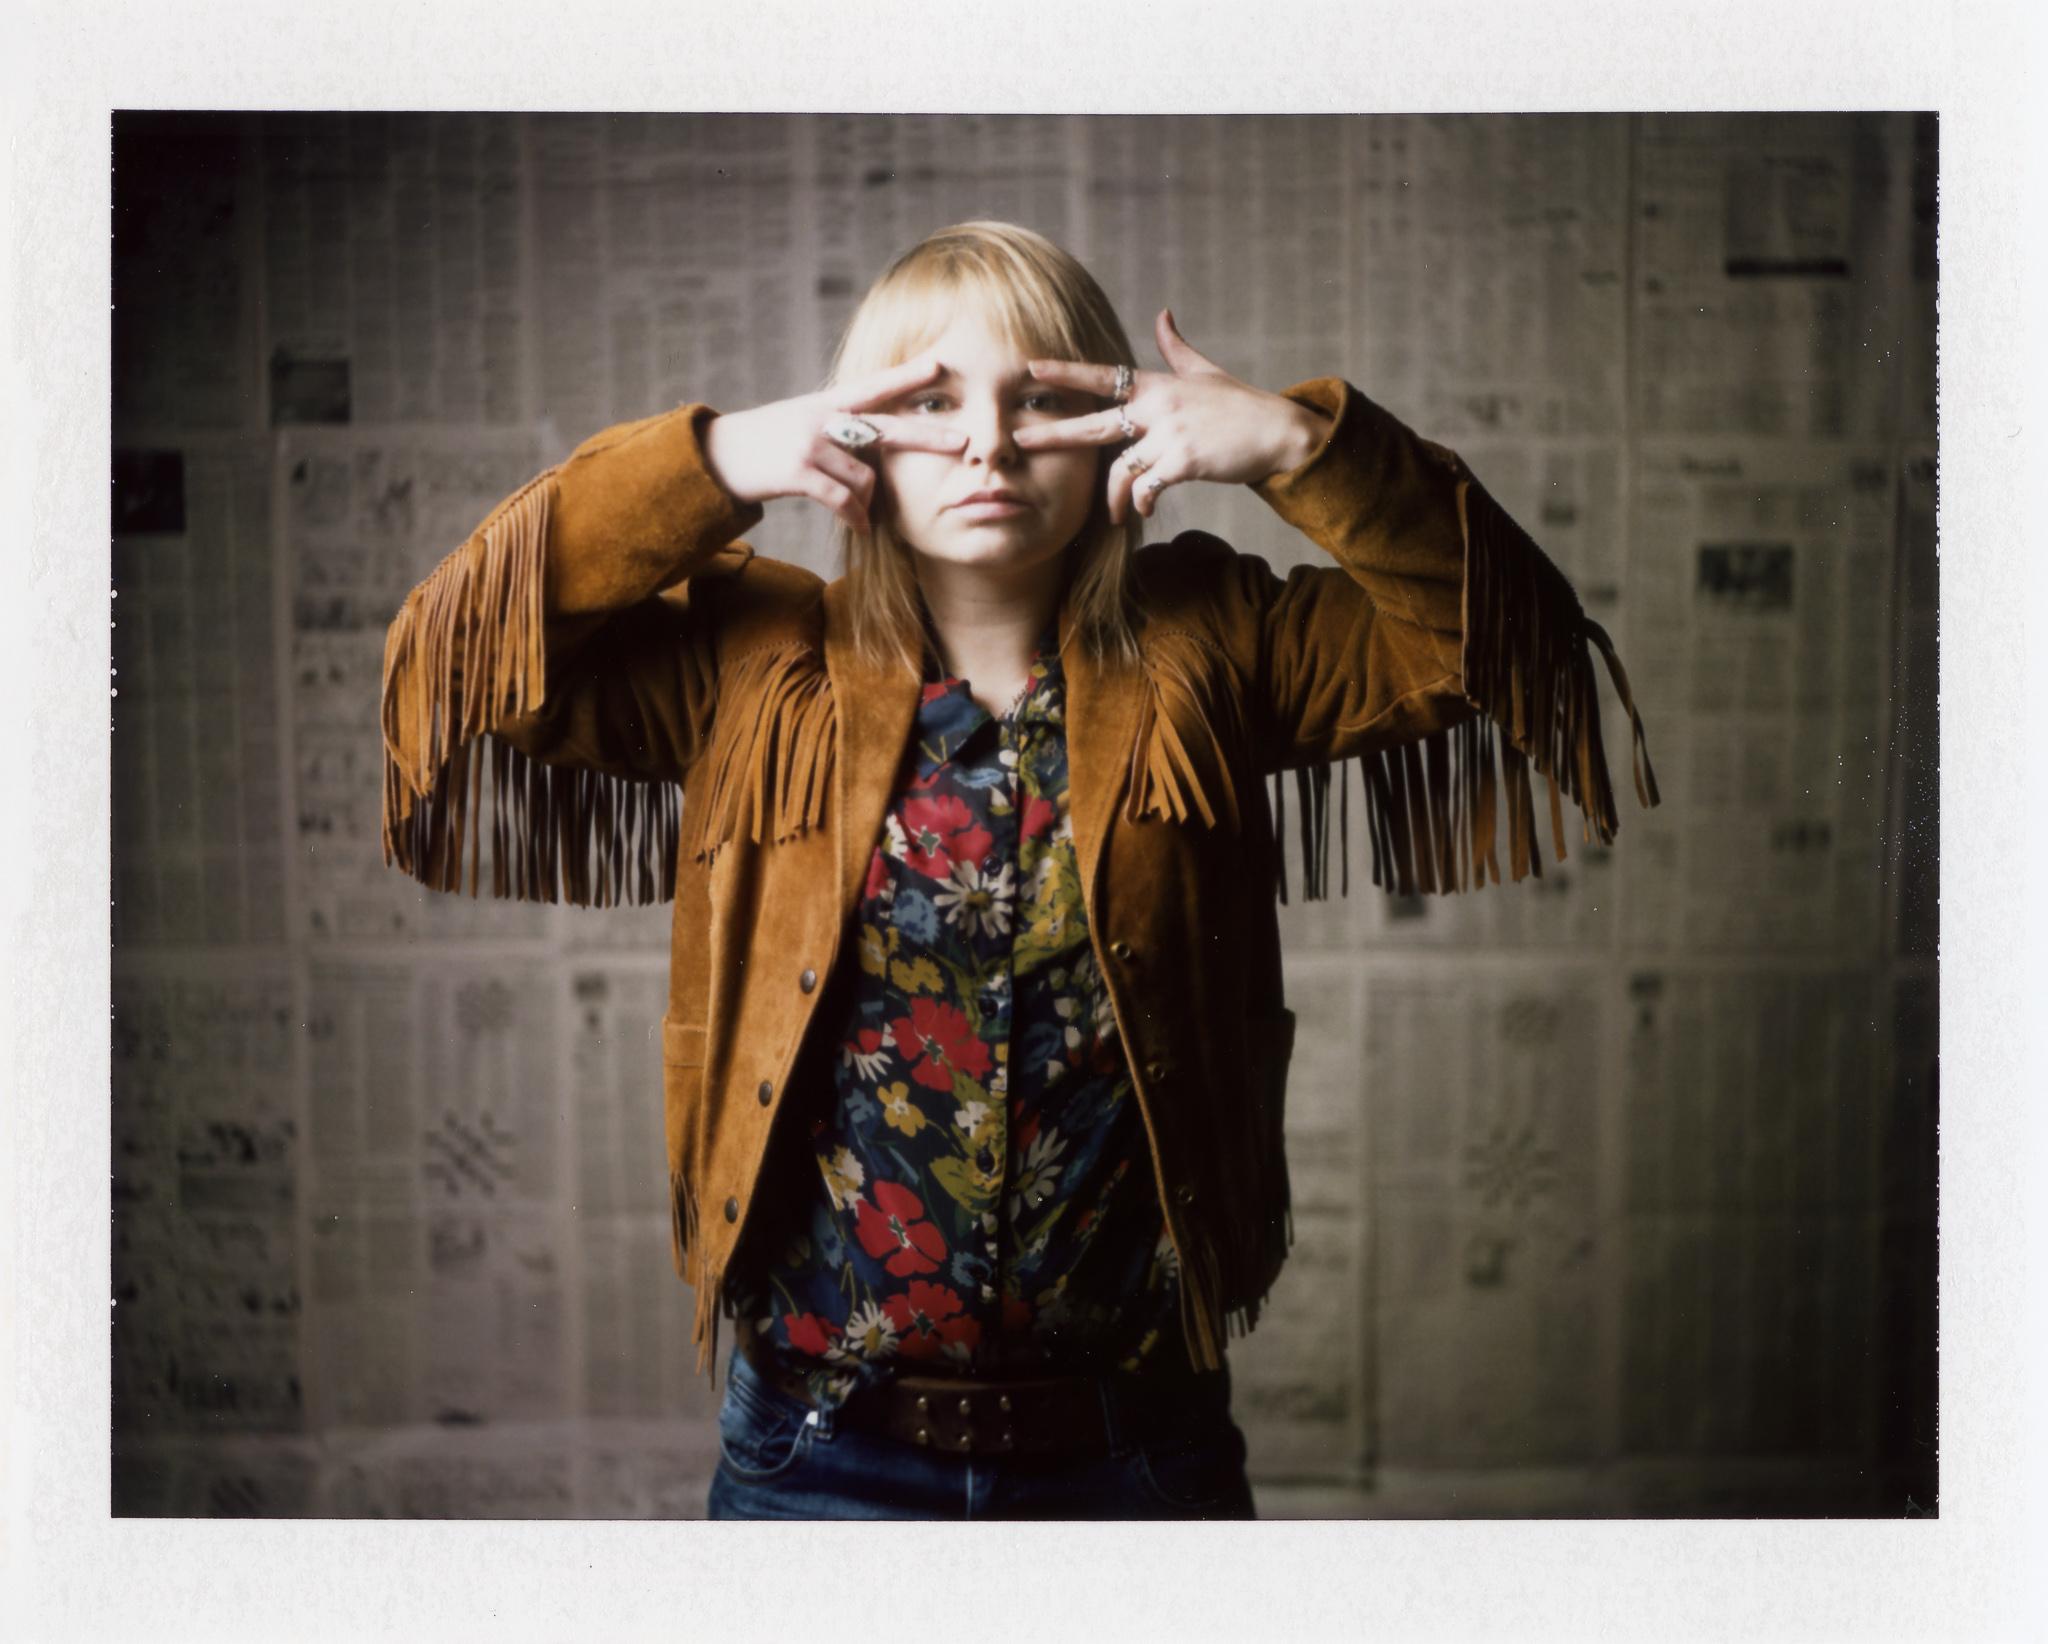 Model / Photographer:Macie Moon Pietrowicz (Macie Moon Photography)  Film: Fujifilm FP-100C